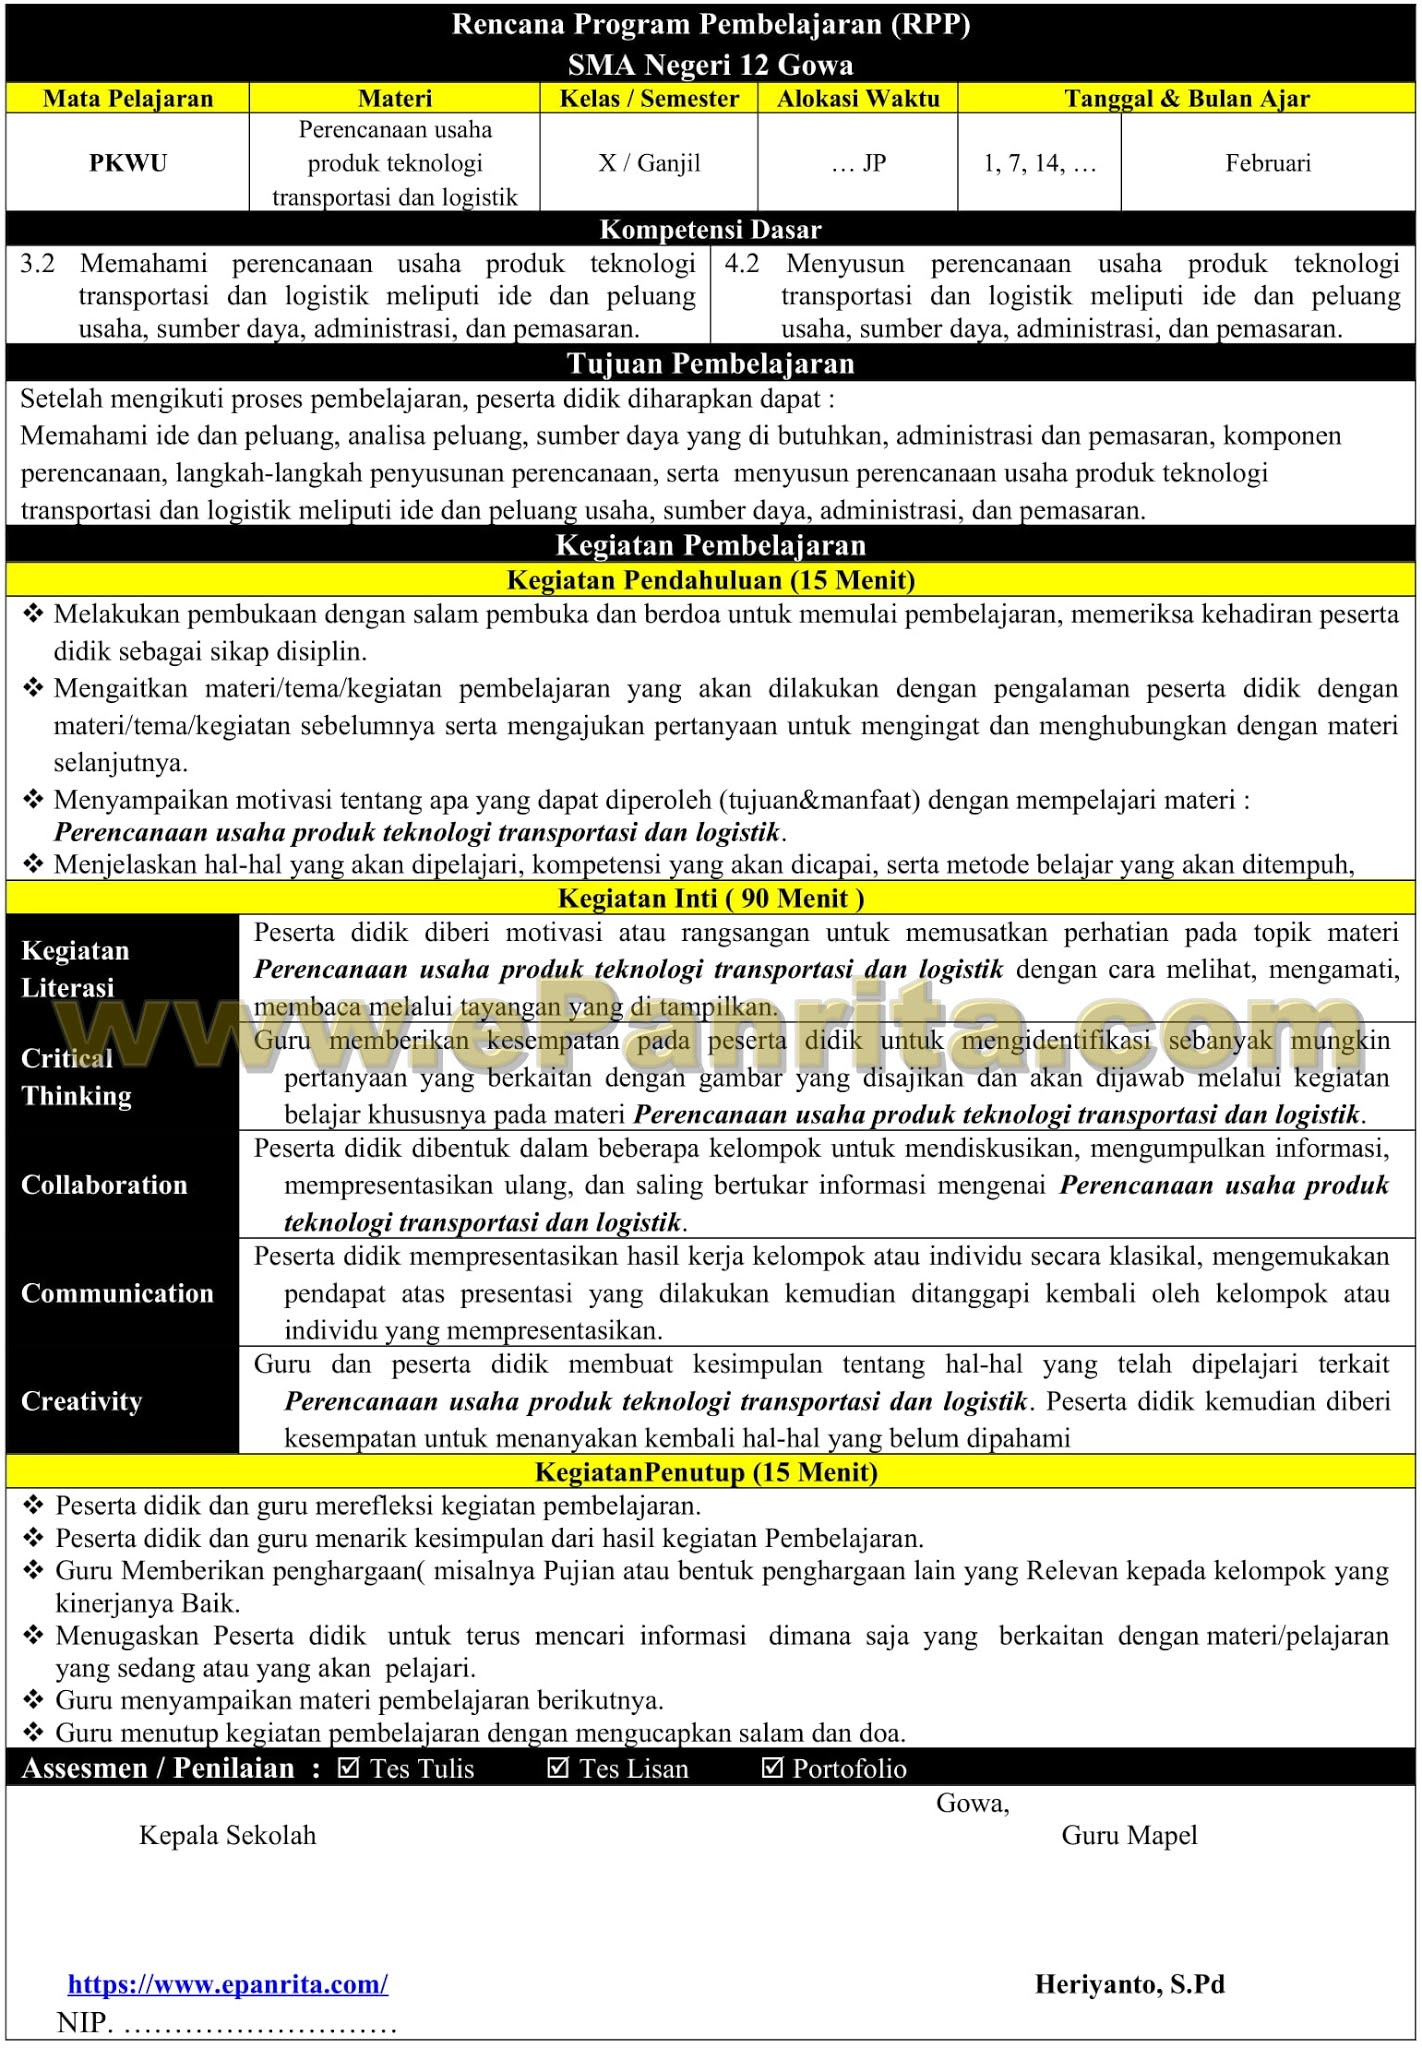 RPP 1 Halaman Prakarya Aspek Rekayasa (Perencanaan usaha produk teknologi transportasi dan logistik)